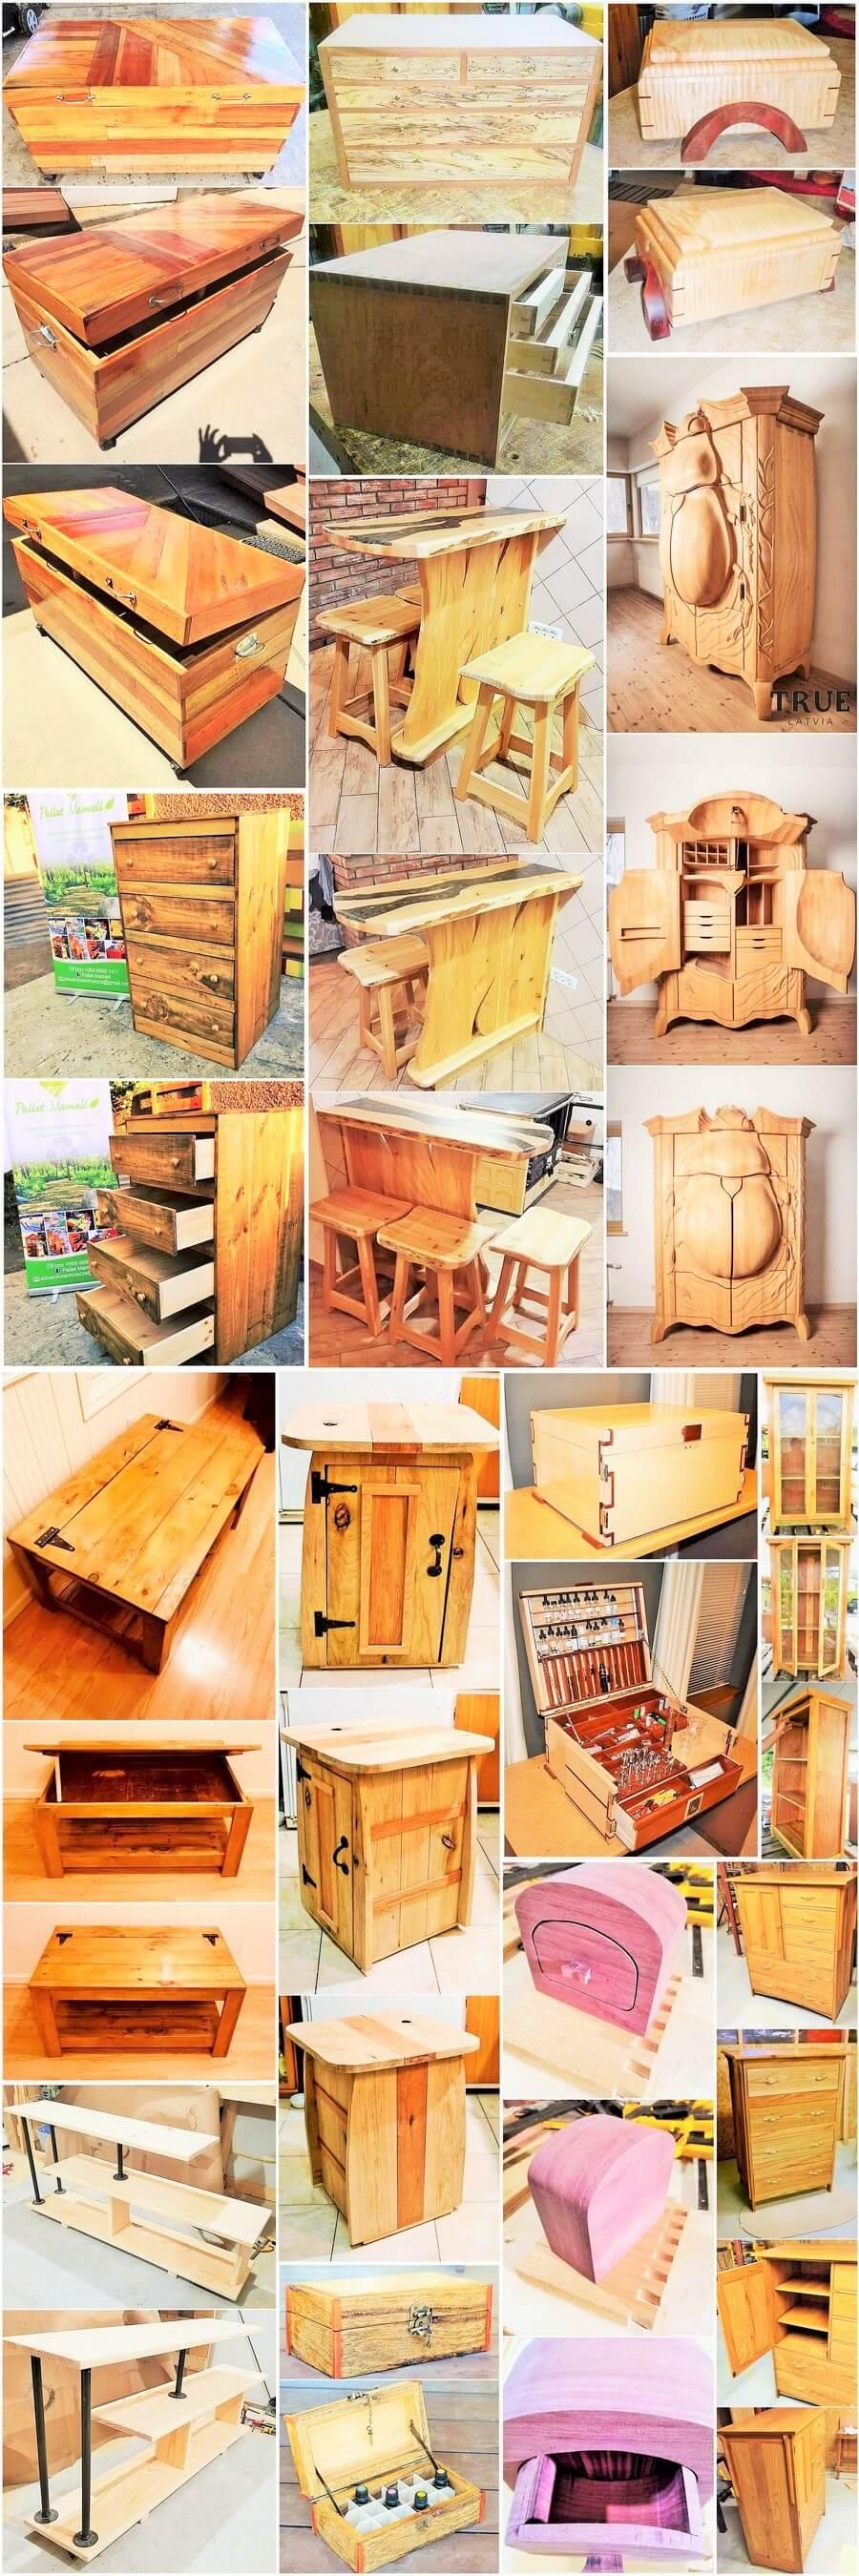 wooden made futniture